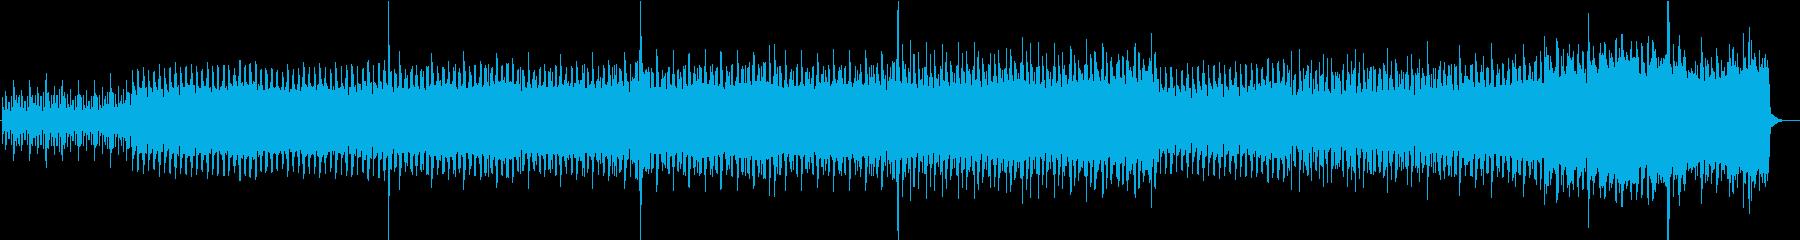 signalの再生済みの波形